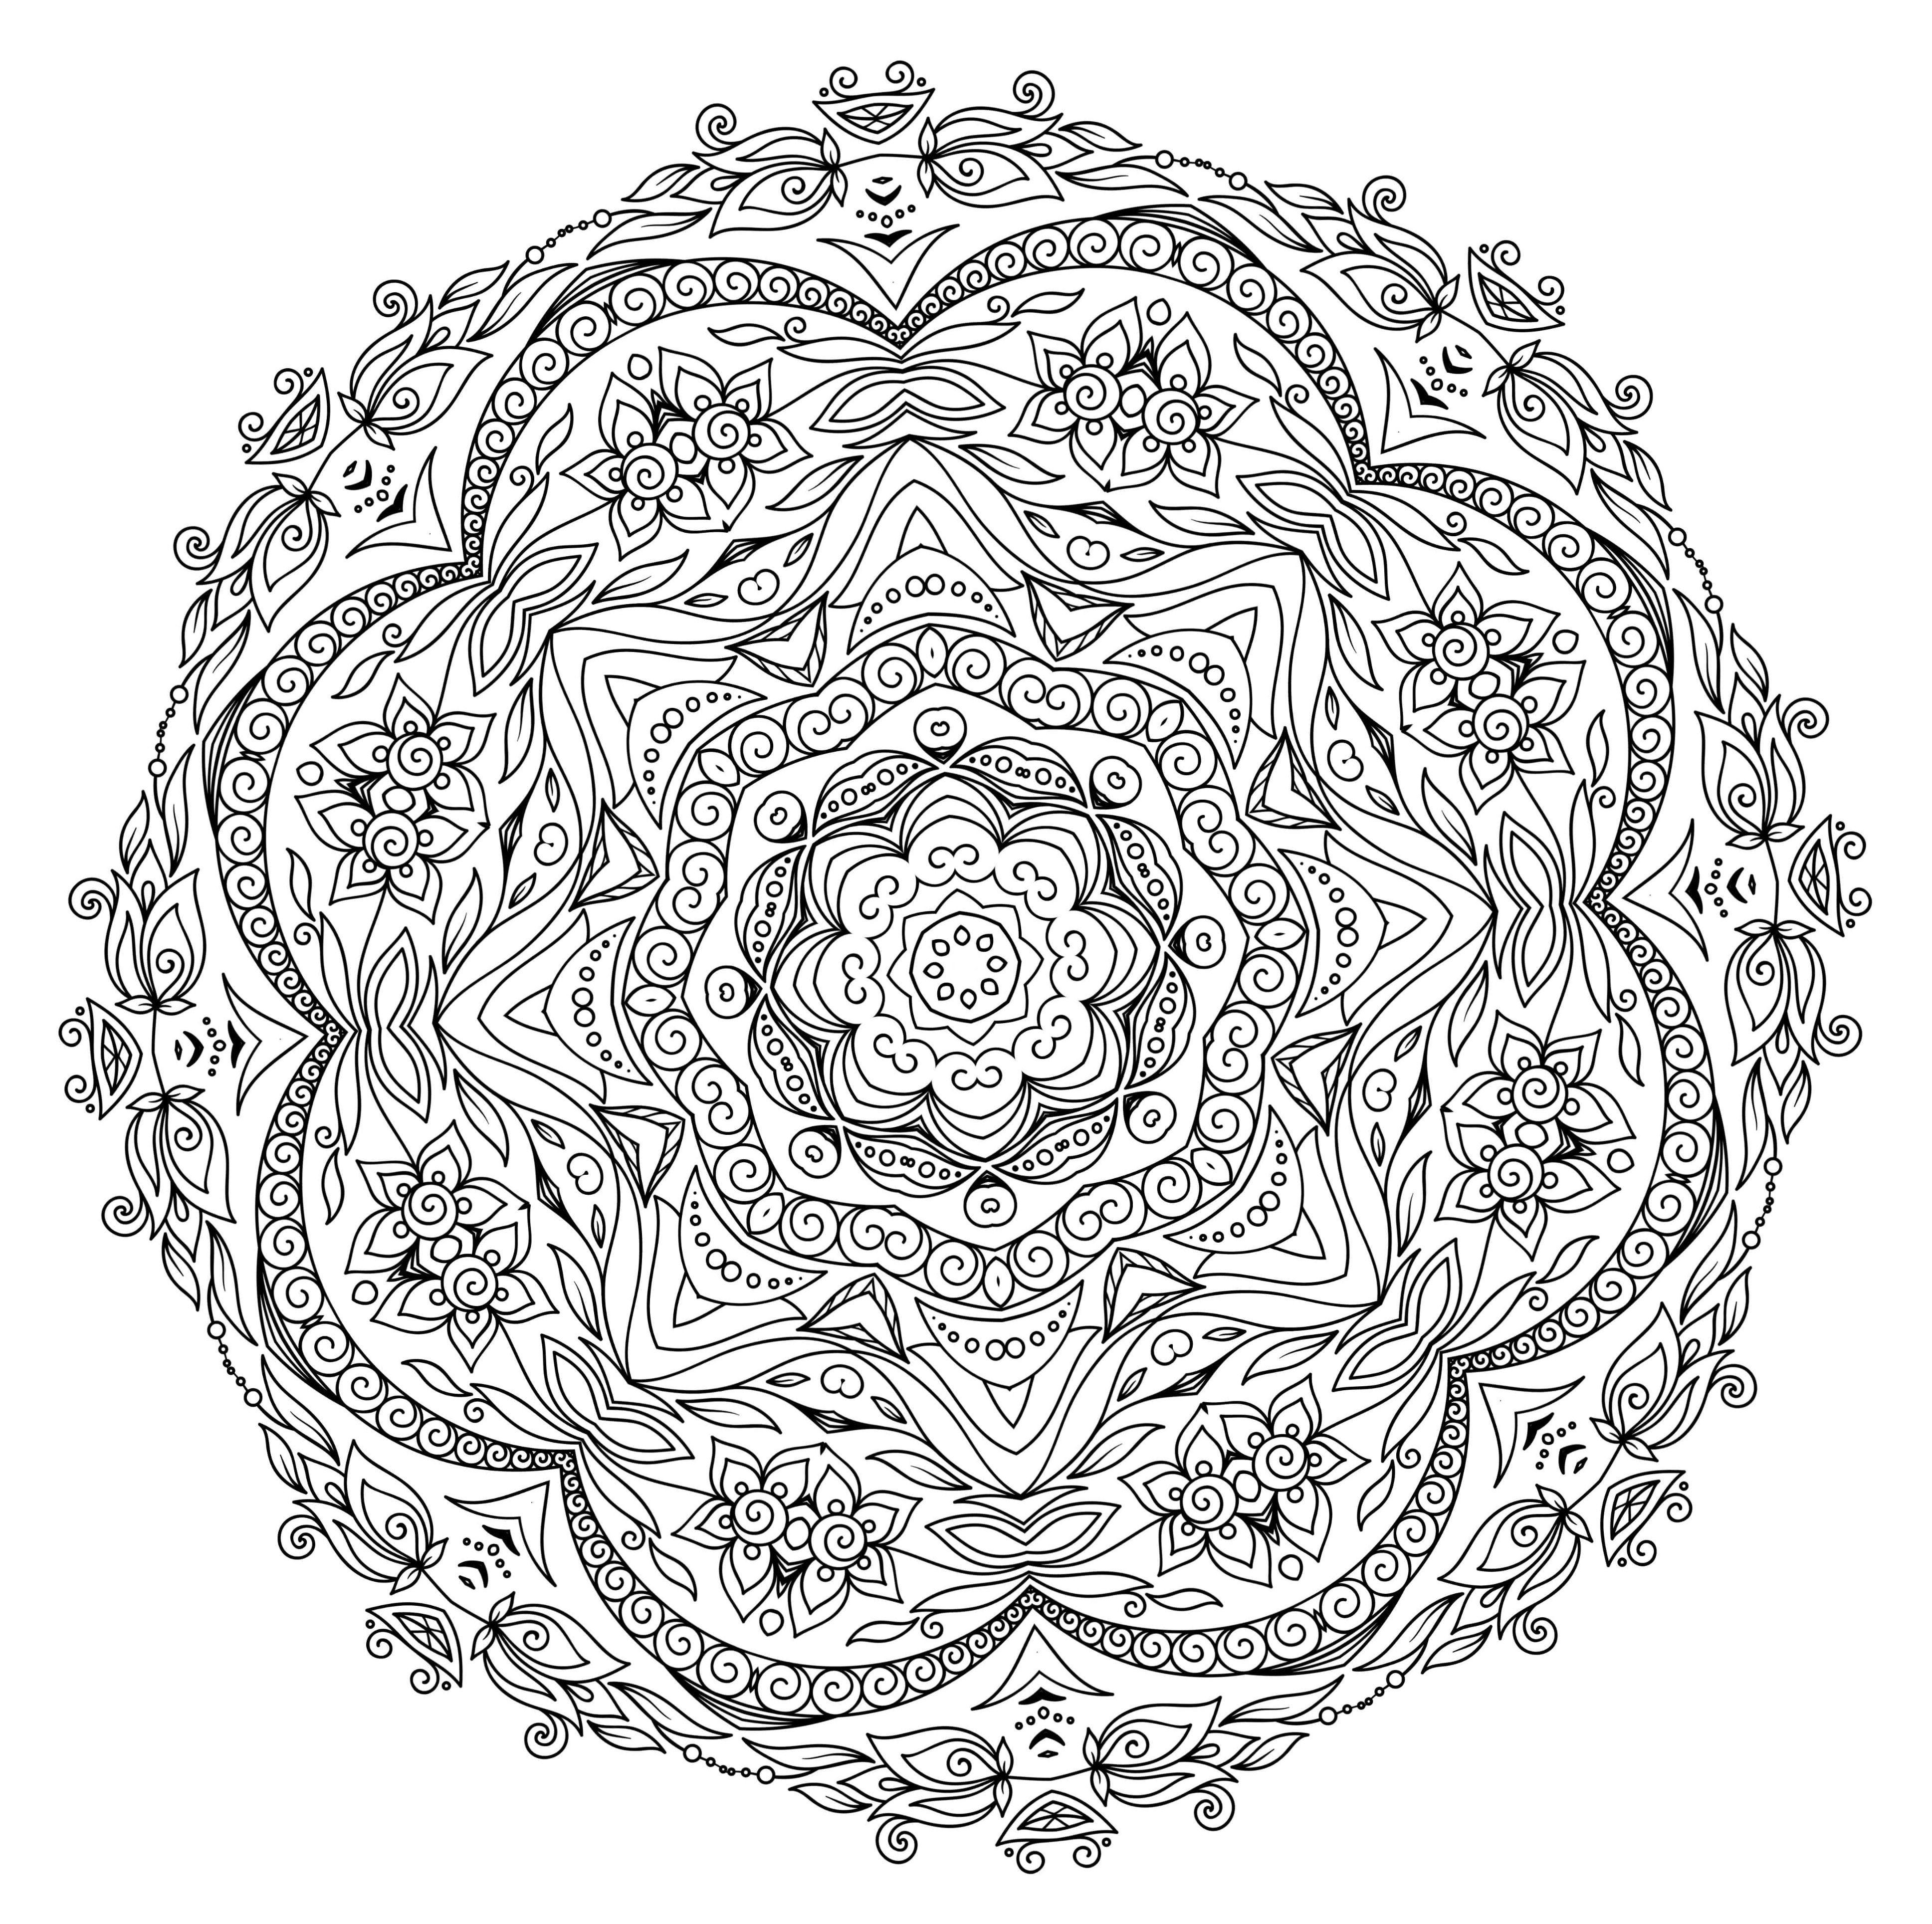 5 Free Printable Coloring Pages: Mandala Templates | Mental Health - Free Printable Mandala Patterns